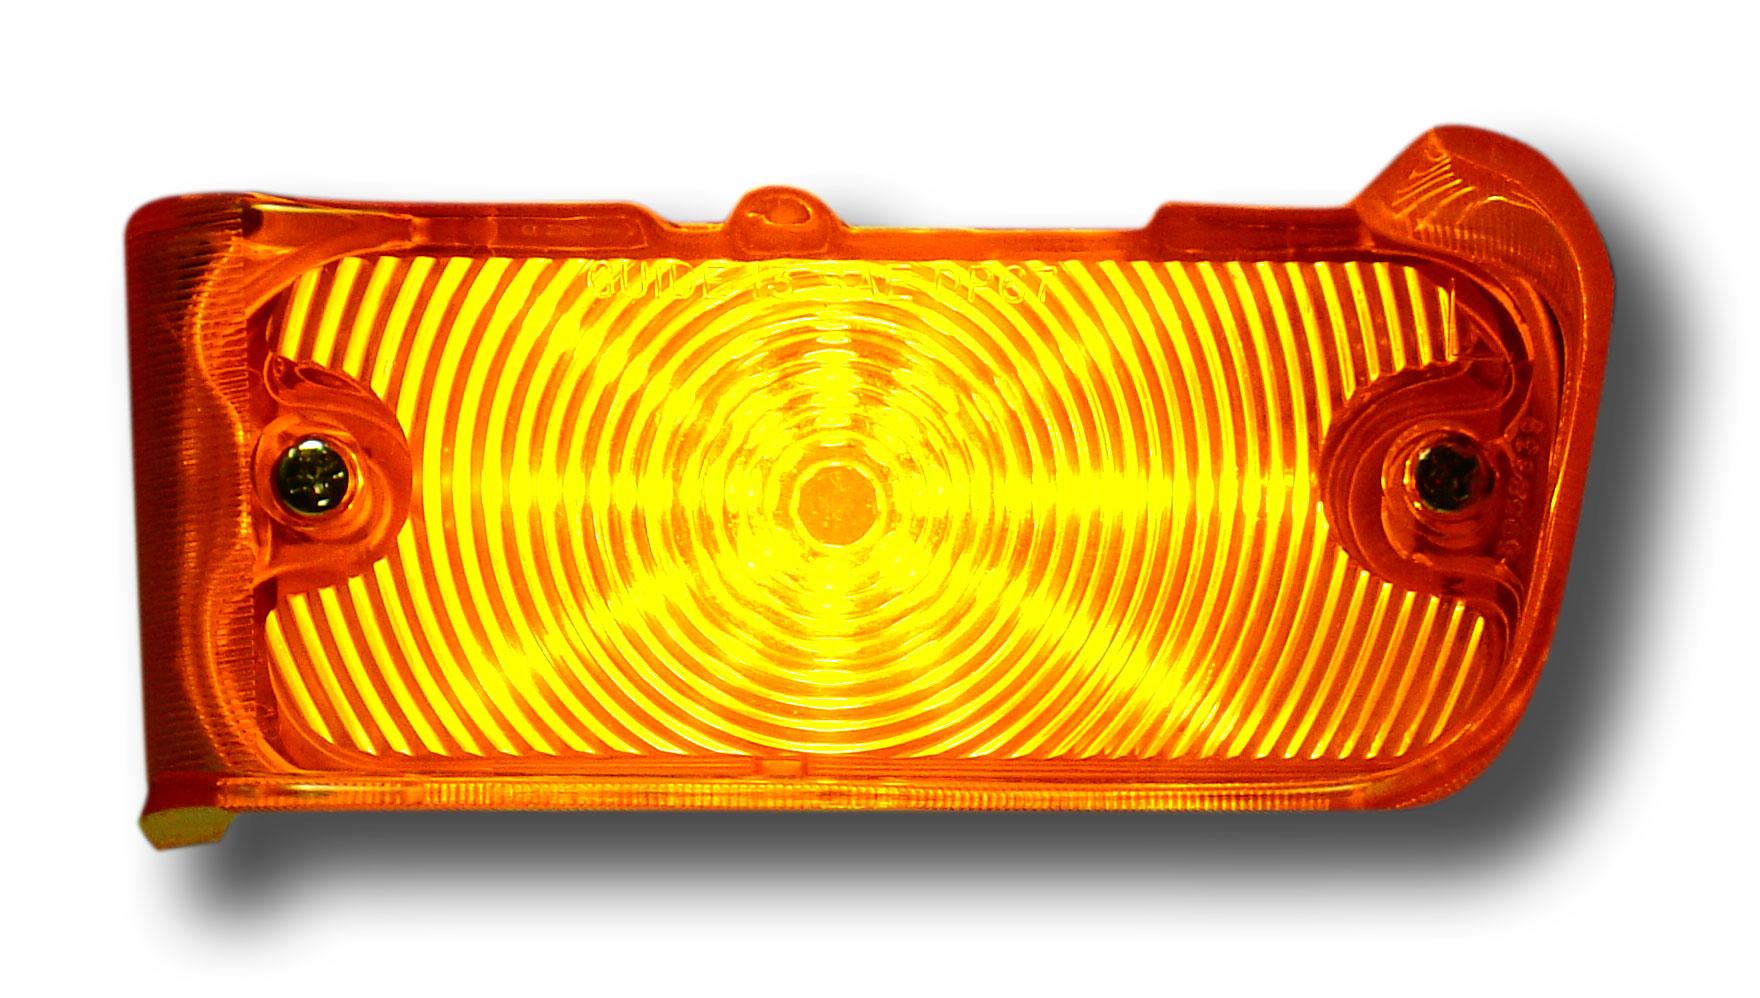 1967 Chevy Chevelle Digital Front Marker Lights.jpg